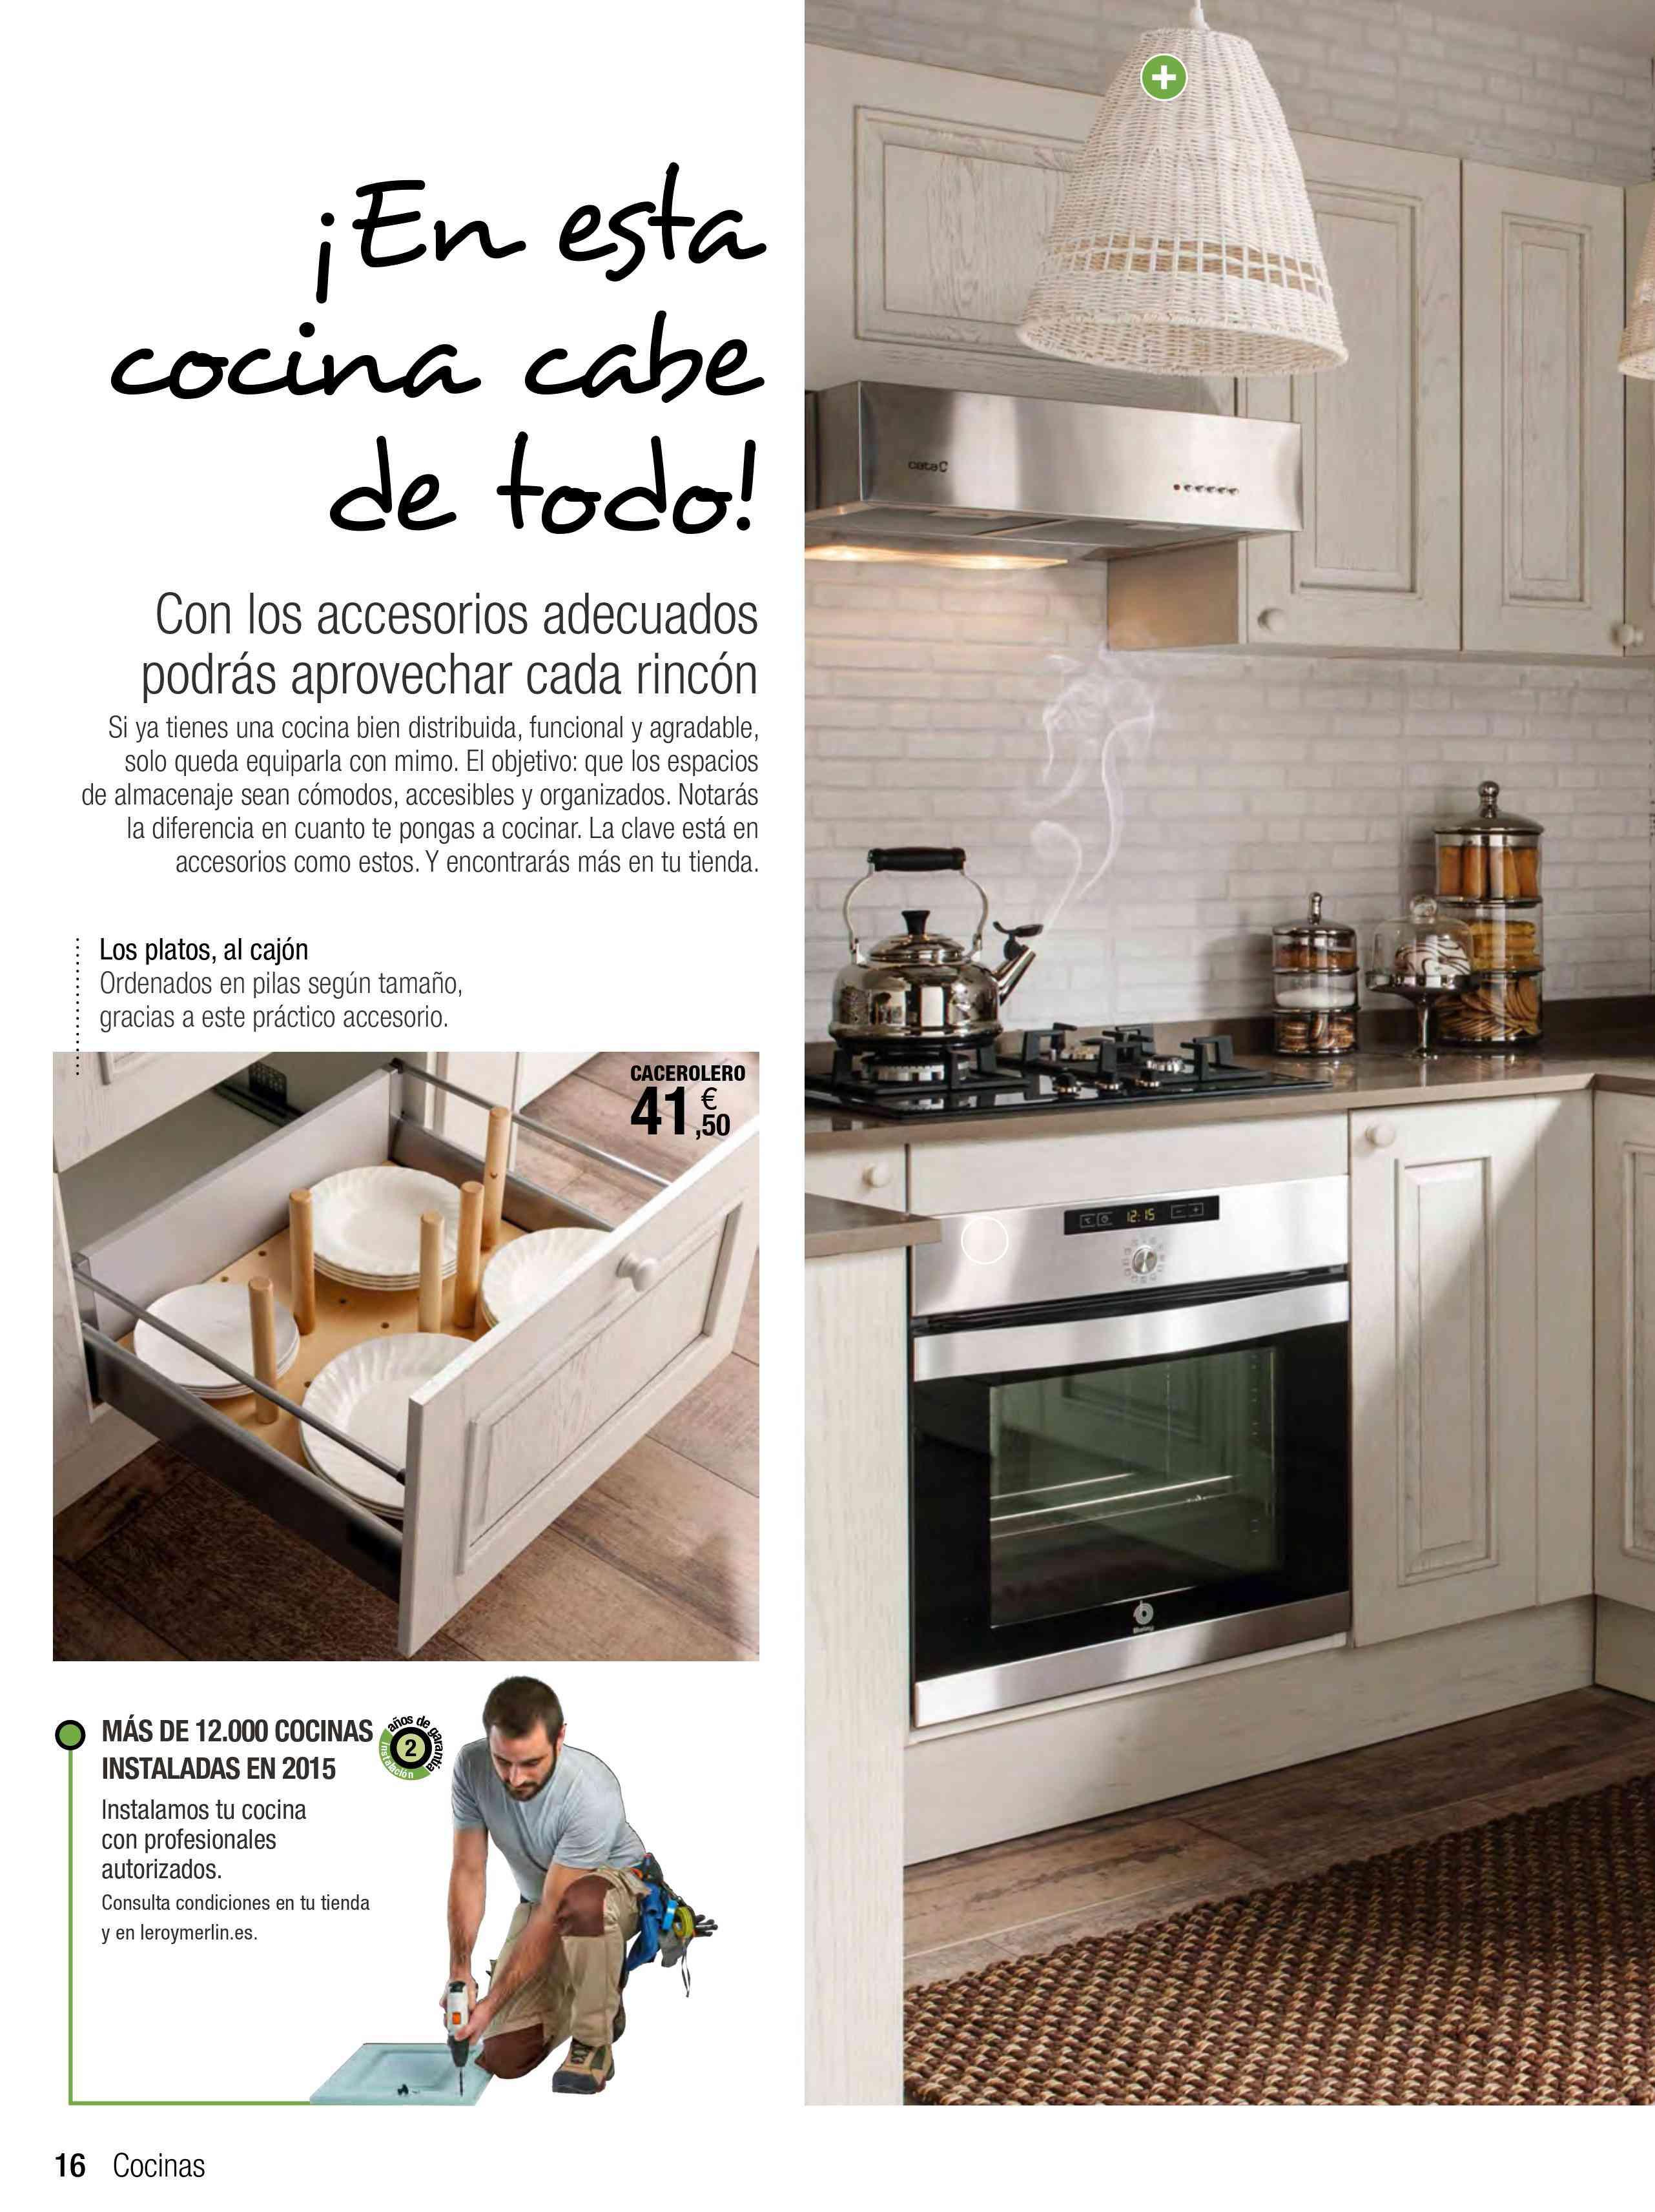 Cocinas leroy merlin catalogo awesome vinilos para - Catalogo espejos leroy merlin ...